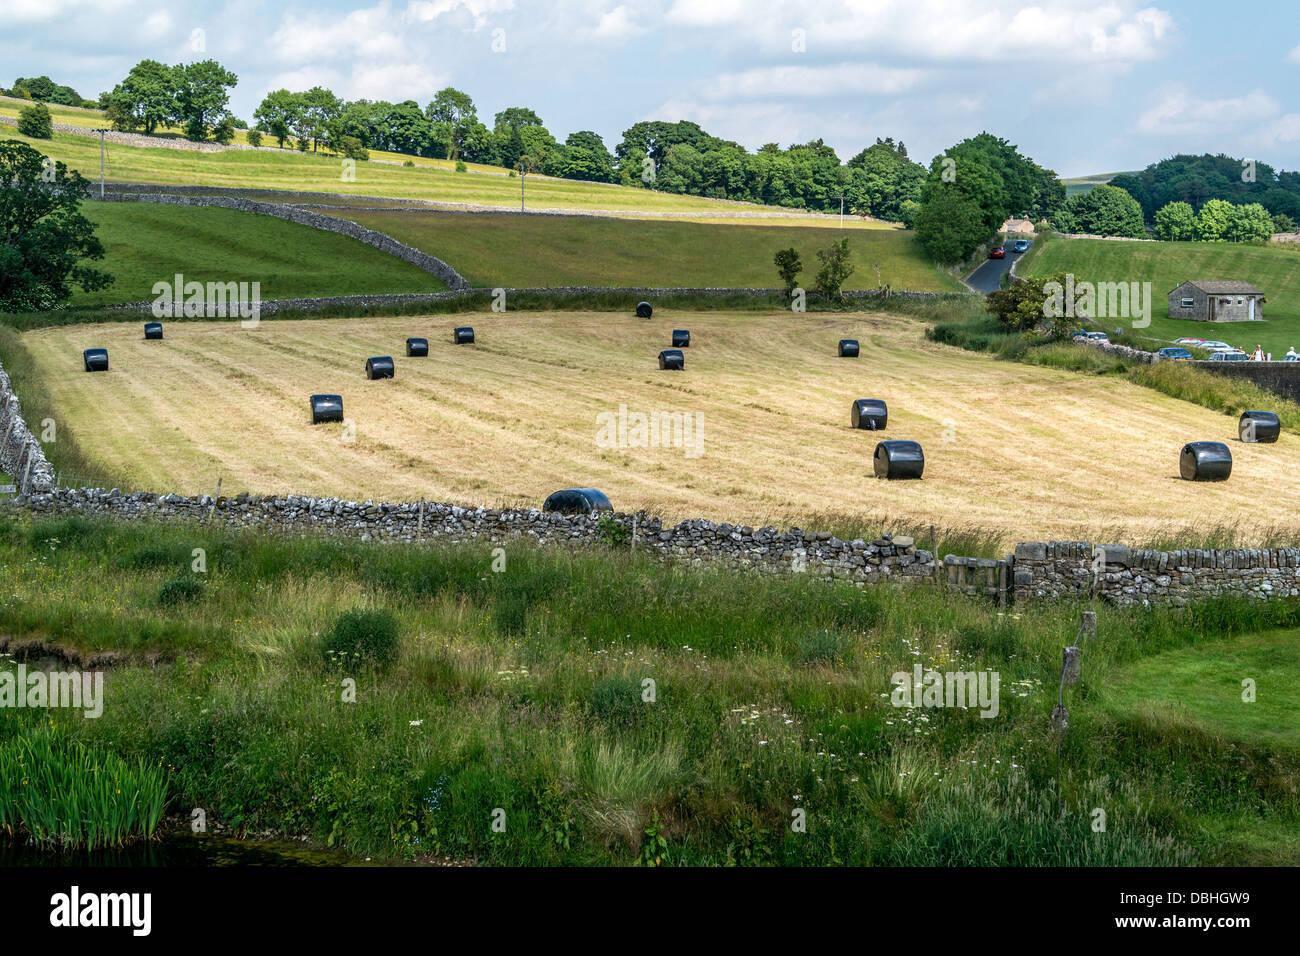 Schwarze Ballen Silage in Bauern Feld Stockfoto